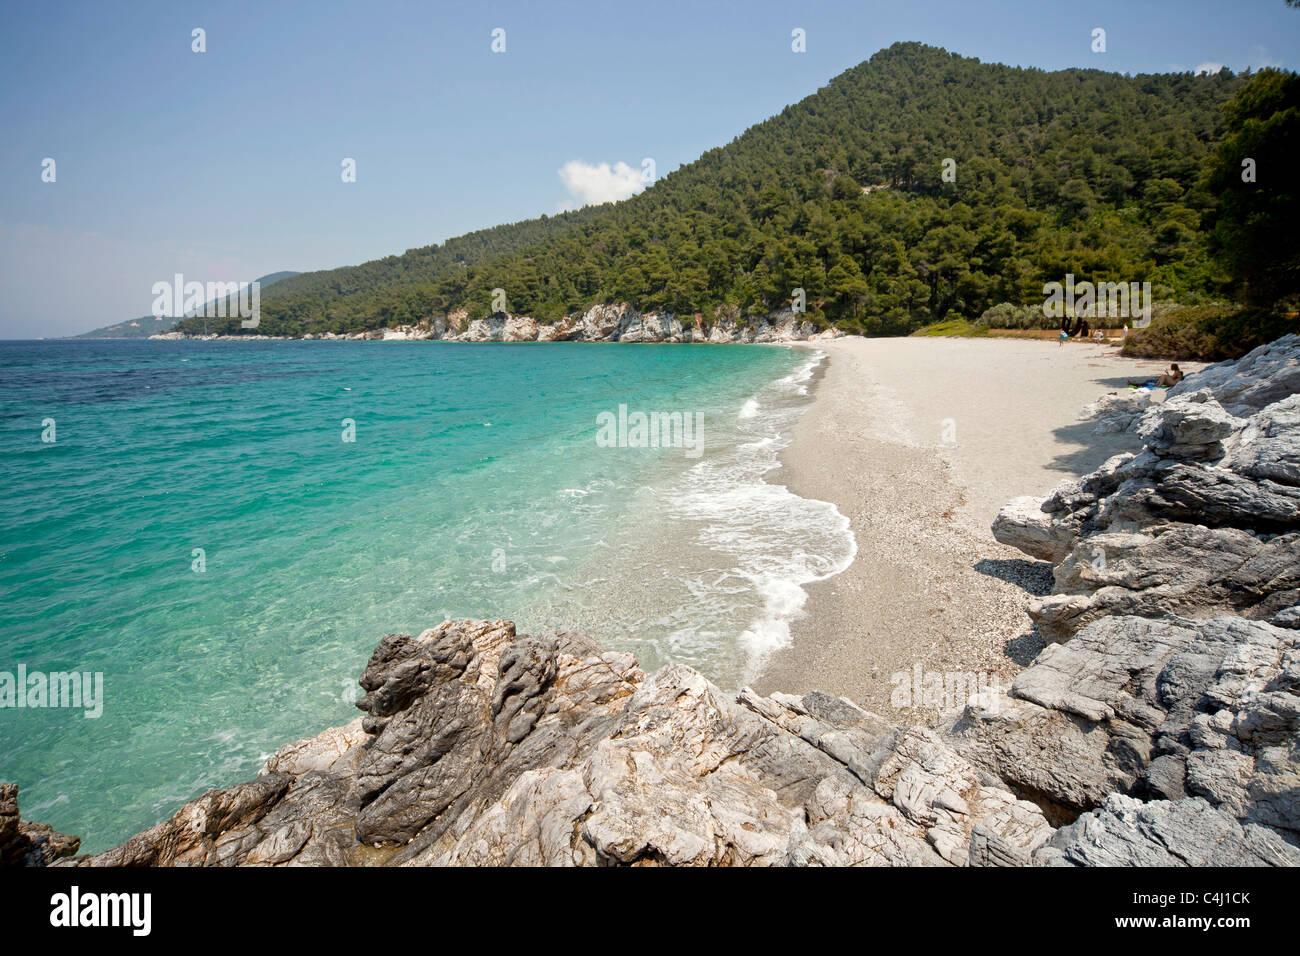 gialos kastani beach and bay mamma mia movie location on skopelos stock photo 37275635 alamy. Black Bedroom Furniture Sets. Home Design Ideas